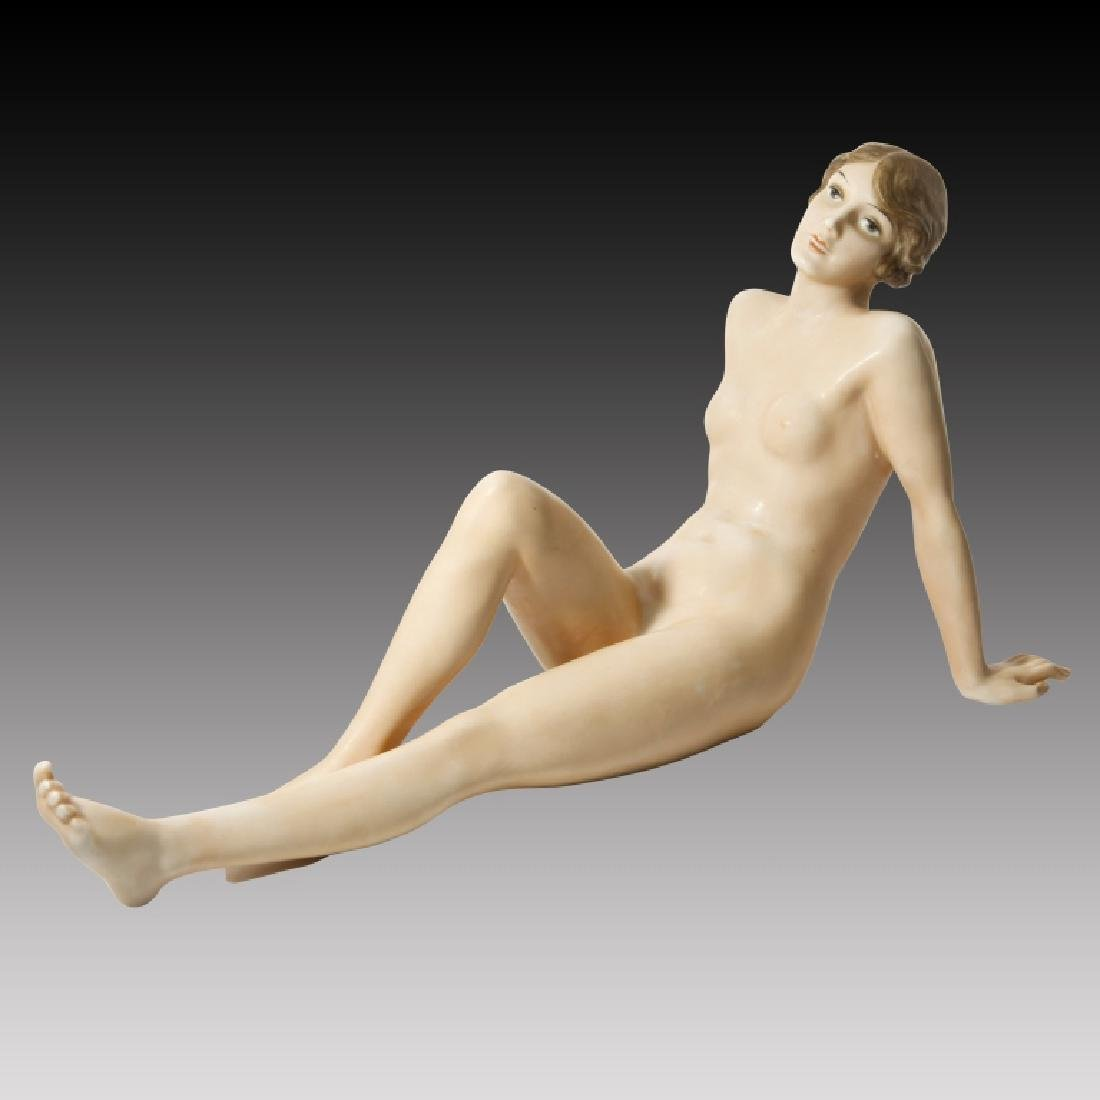 Rosenthal Reclining Nude Woman